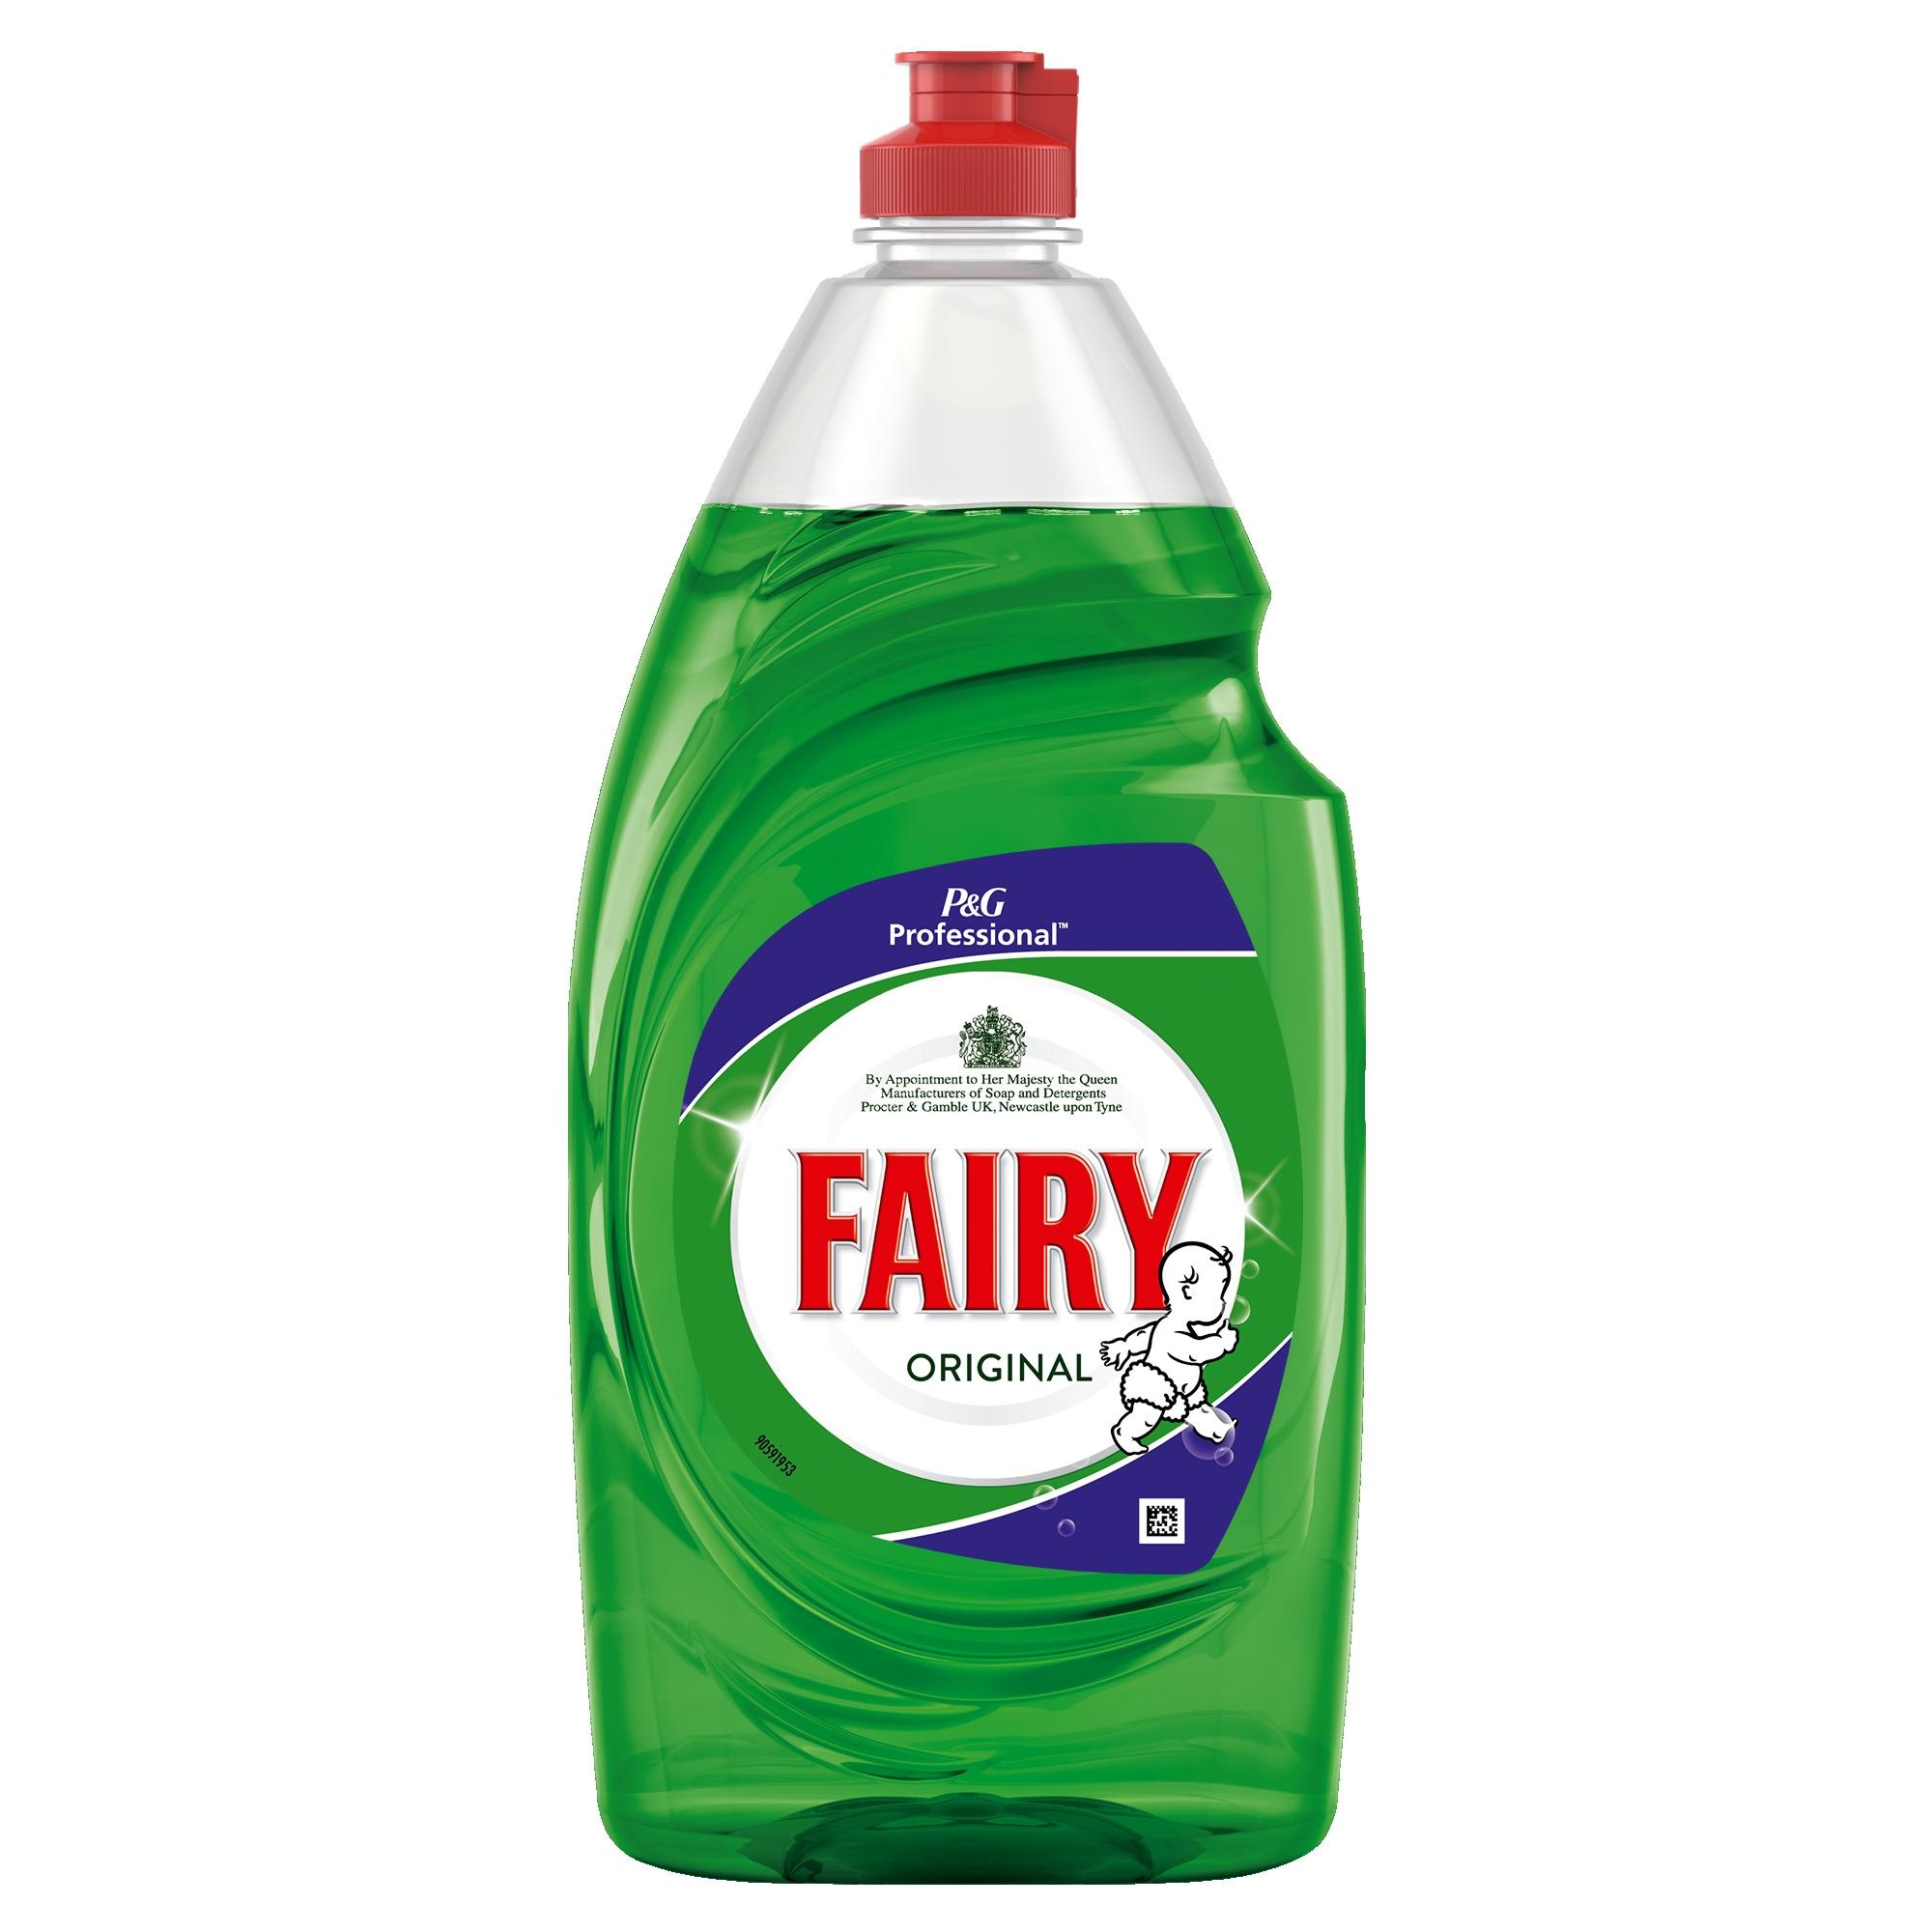 P&G Prof Fairy Washing Up Liquid 6x750ml